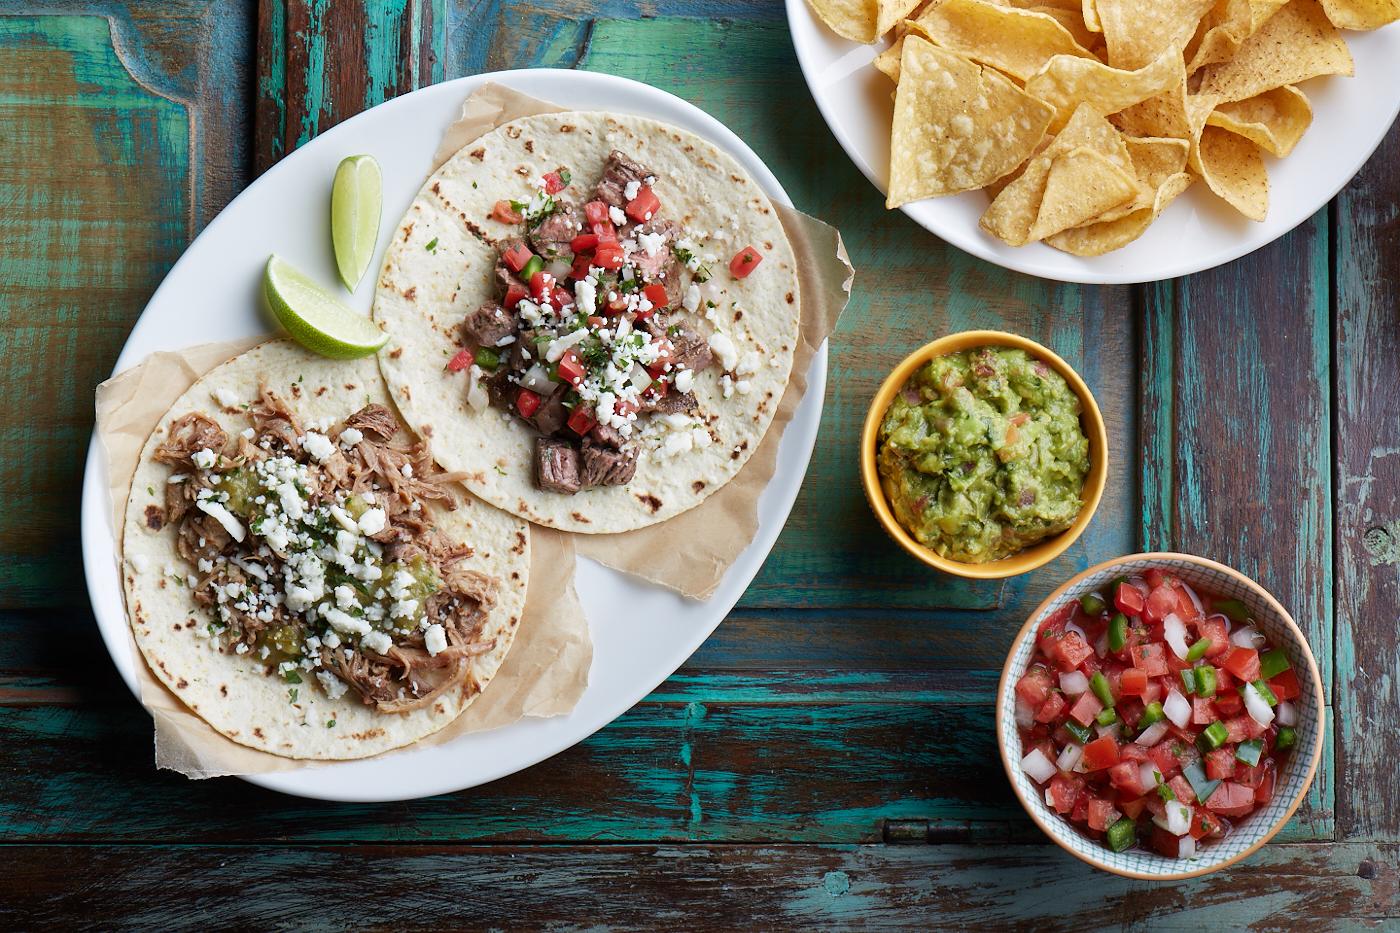 Margaritaville-Hollywood-Beach-Florida-Resort-Jimmy-Buffett-Tacos